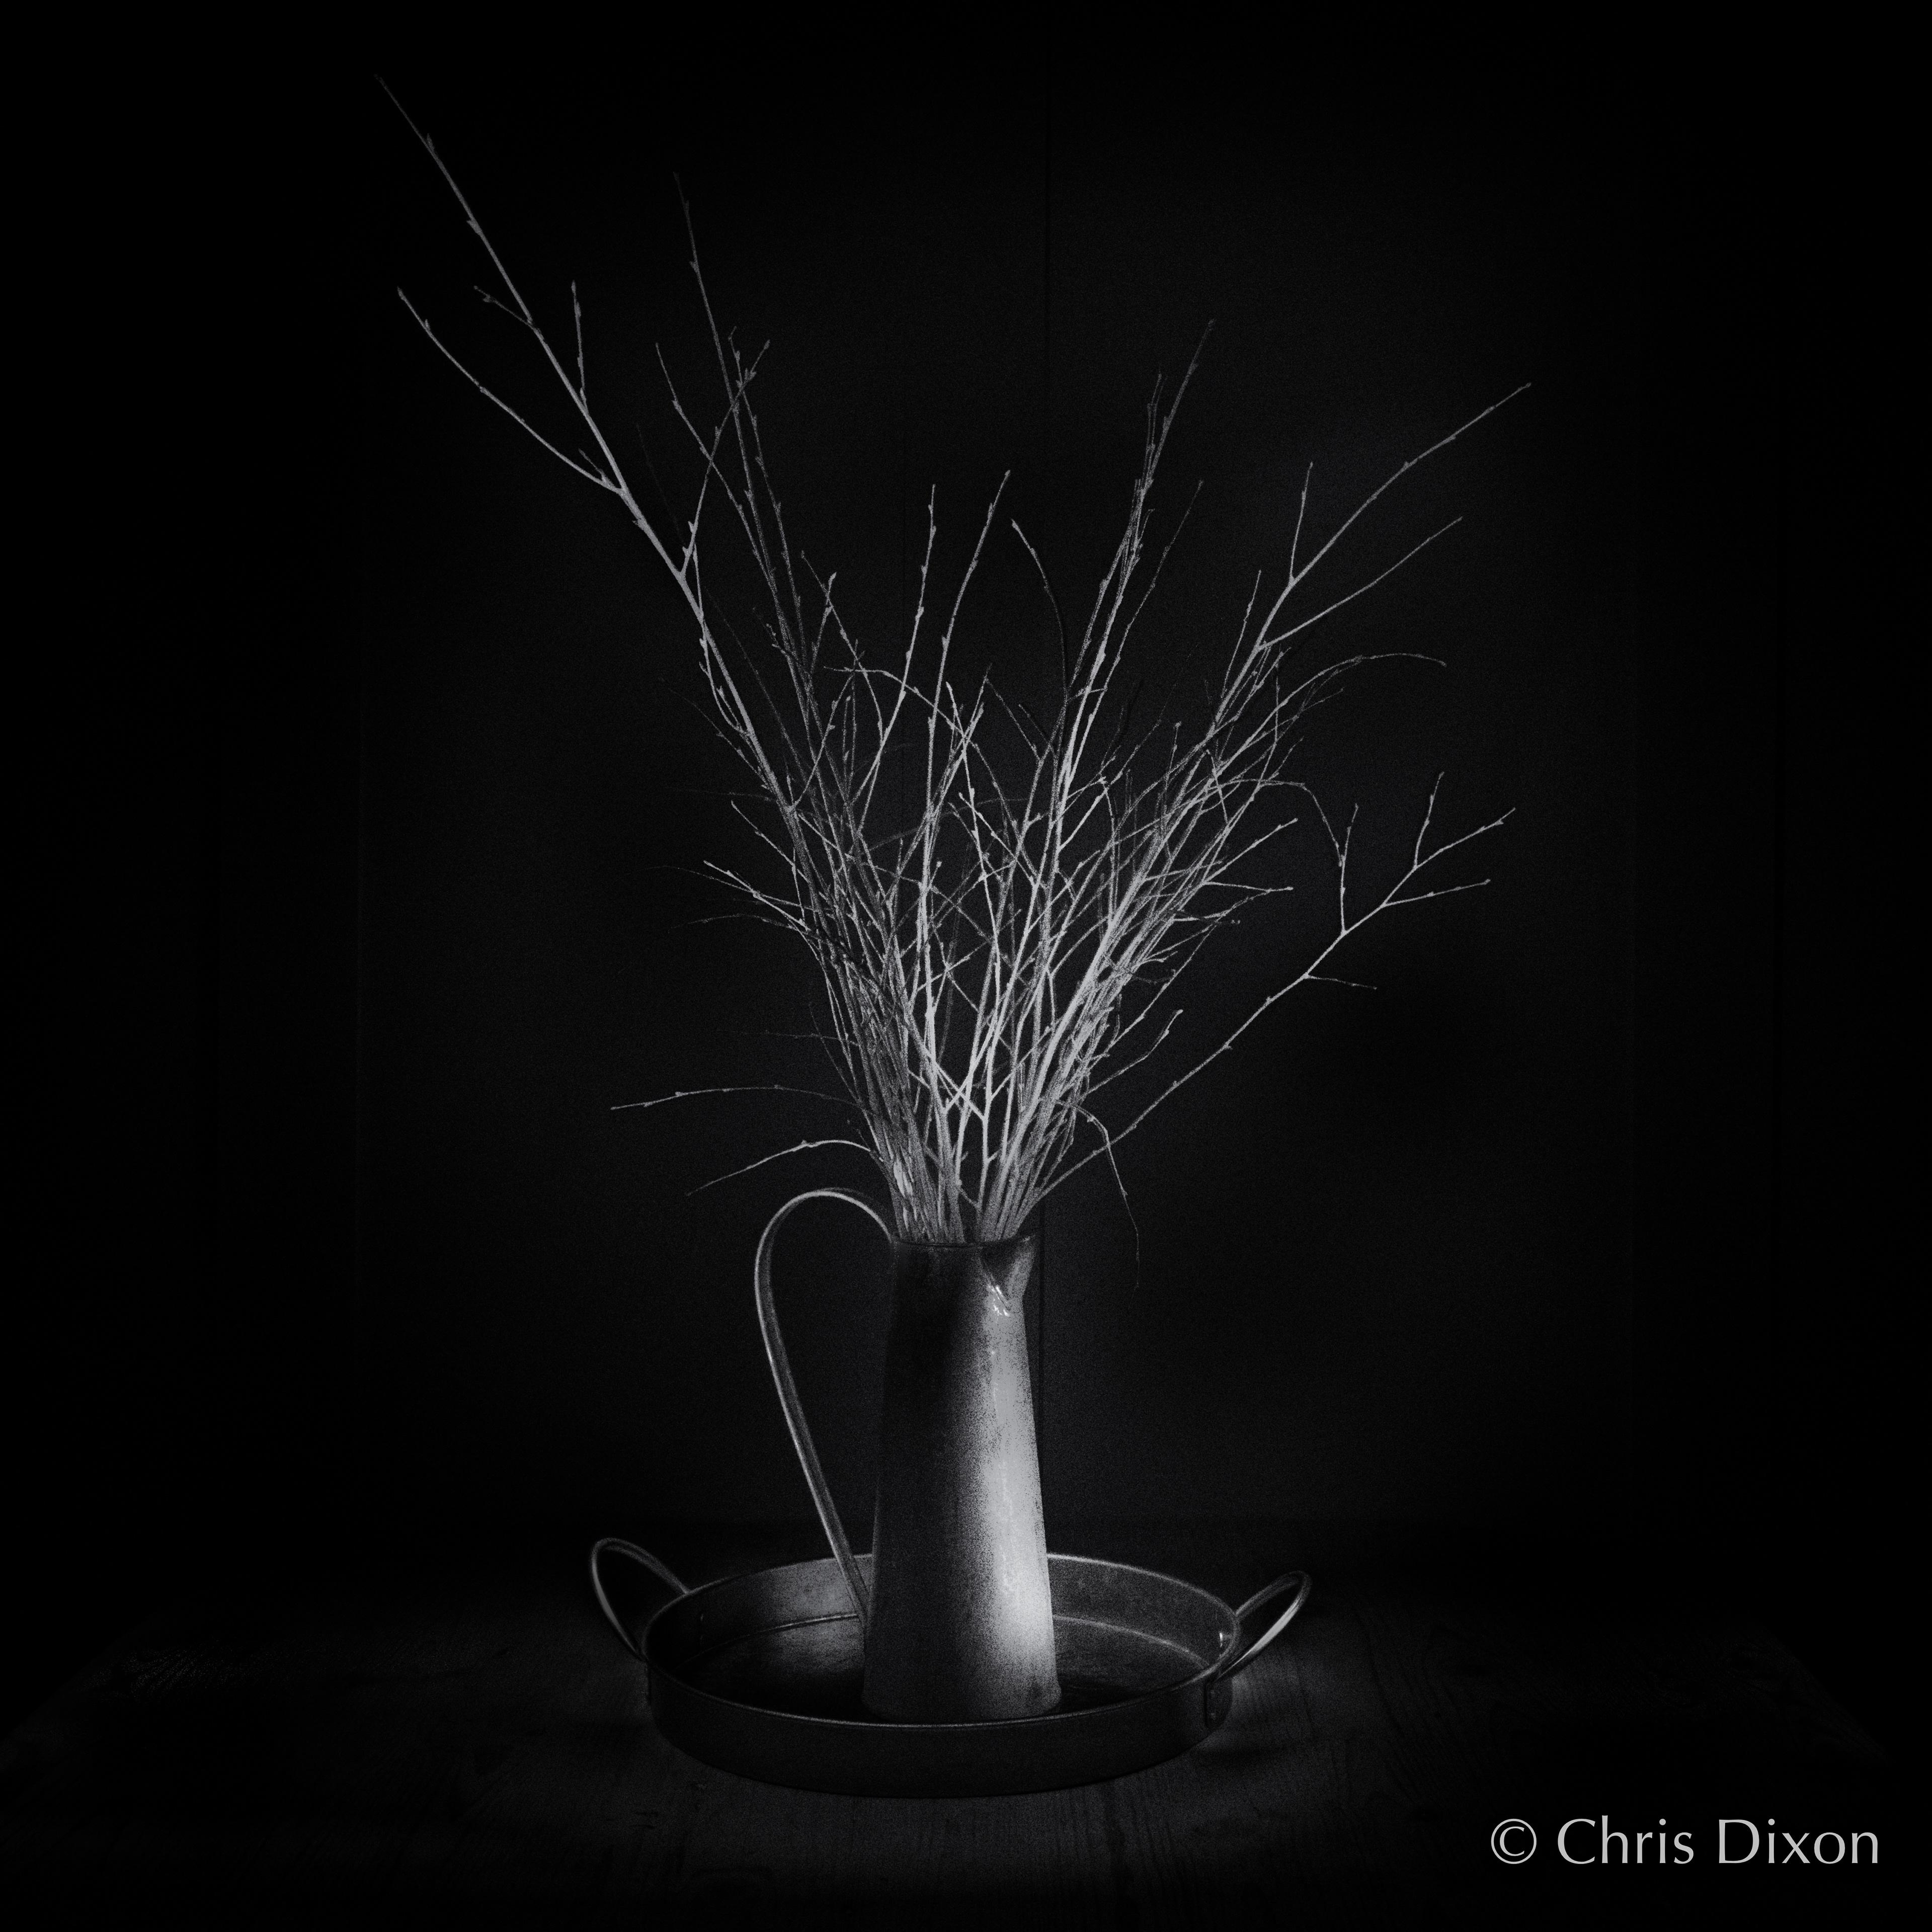 Chris dixon photography still life